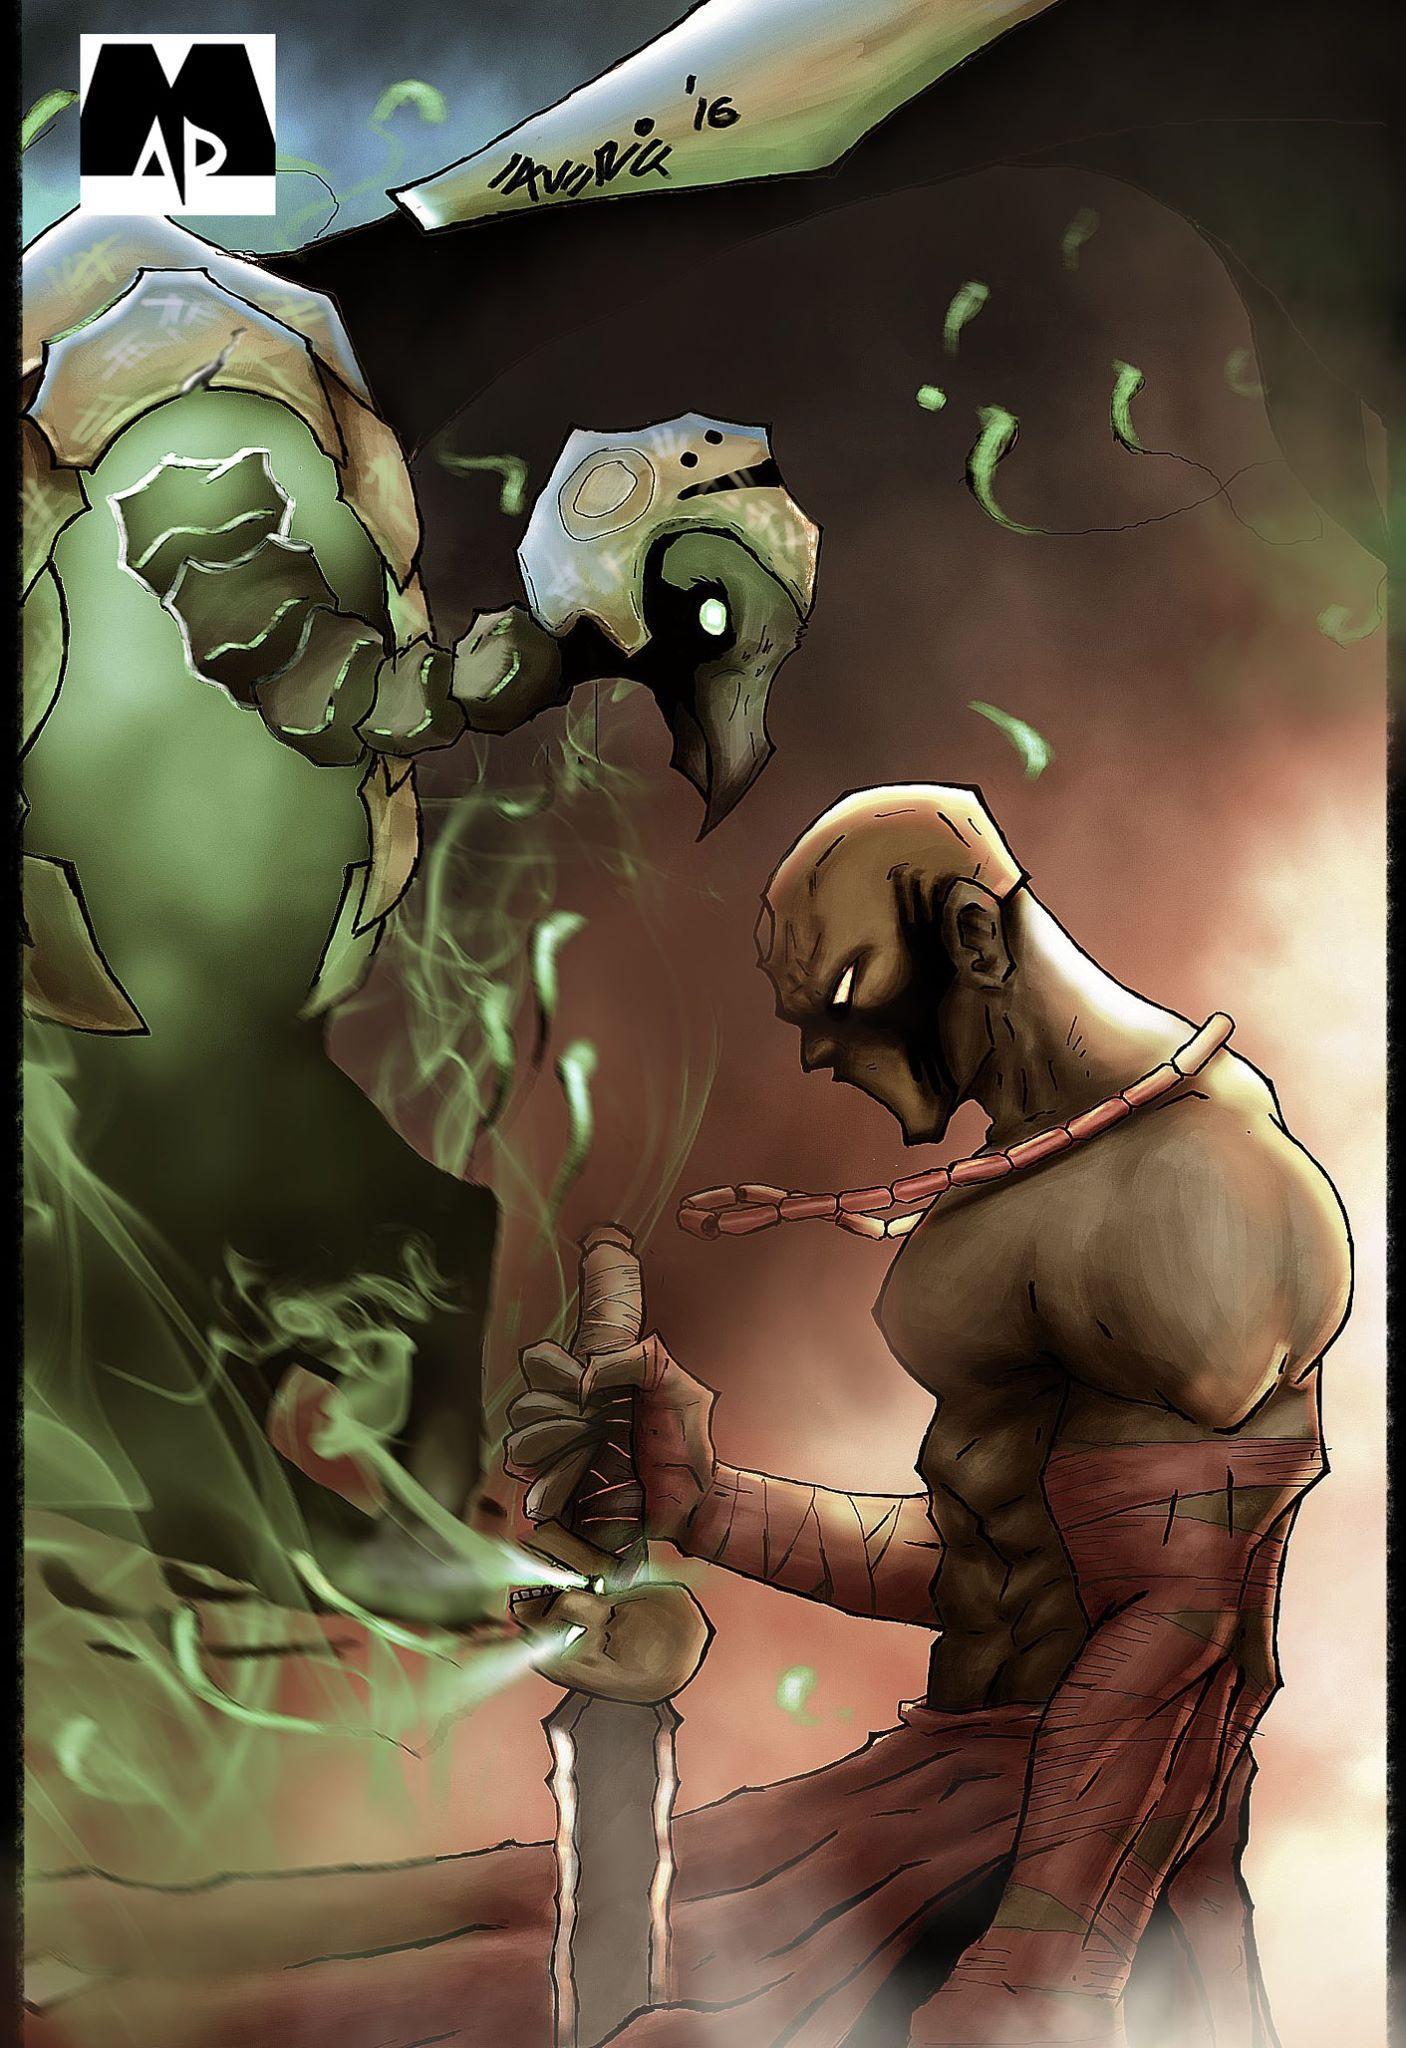 Oro comic book by MAD! Comics. Written by Hafeez Oluwa